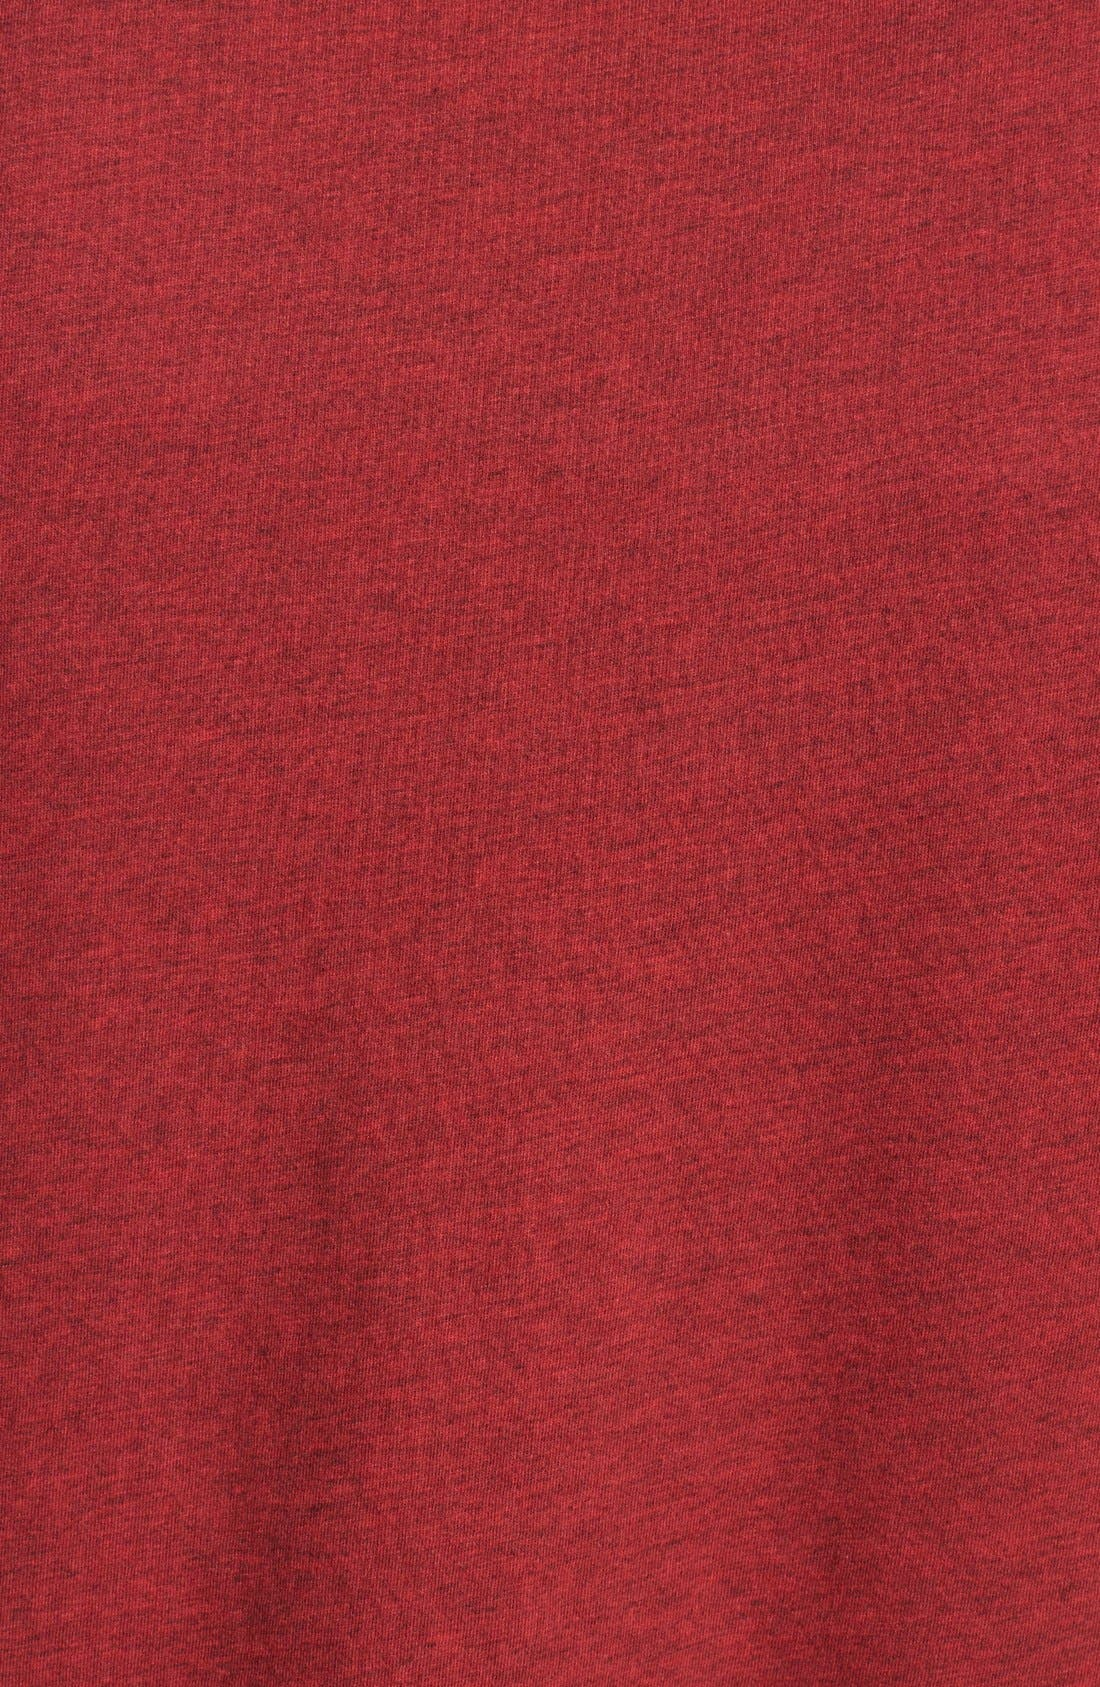 Alternate Image 3  - Burberry Brit 'Potter' T-Shirt